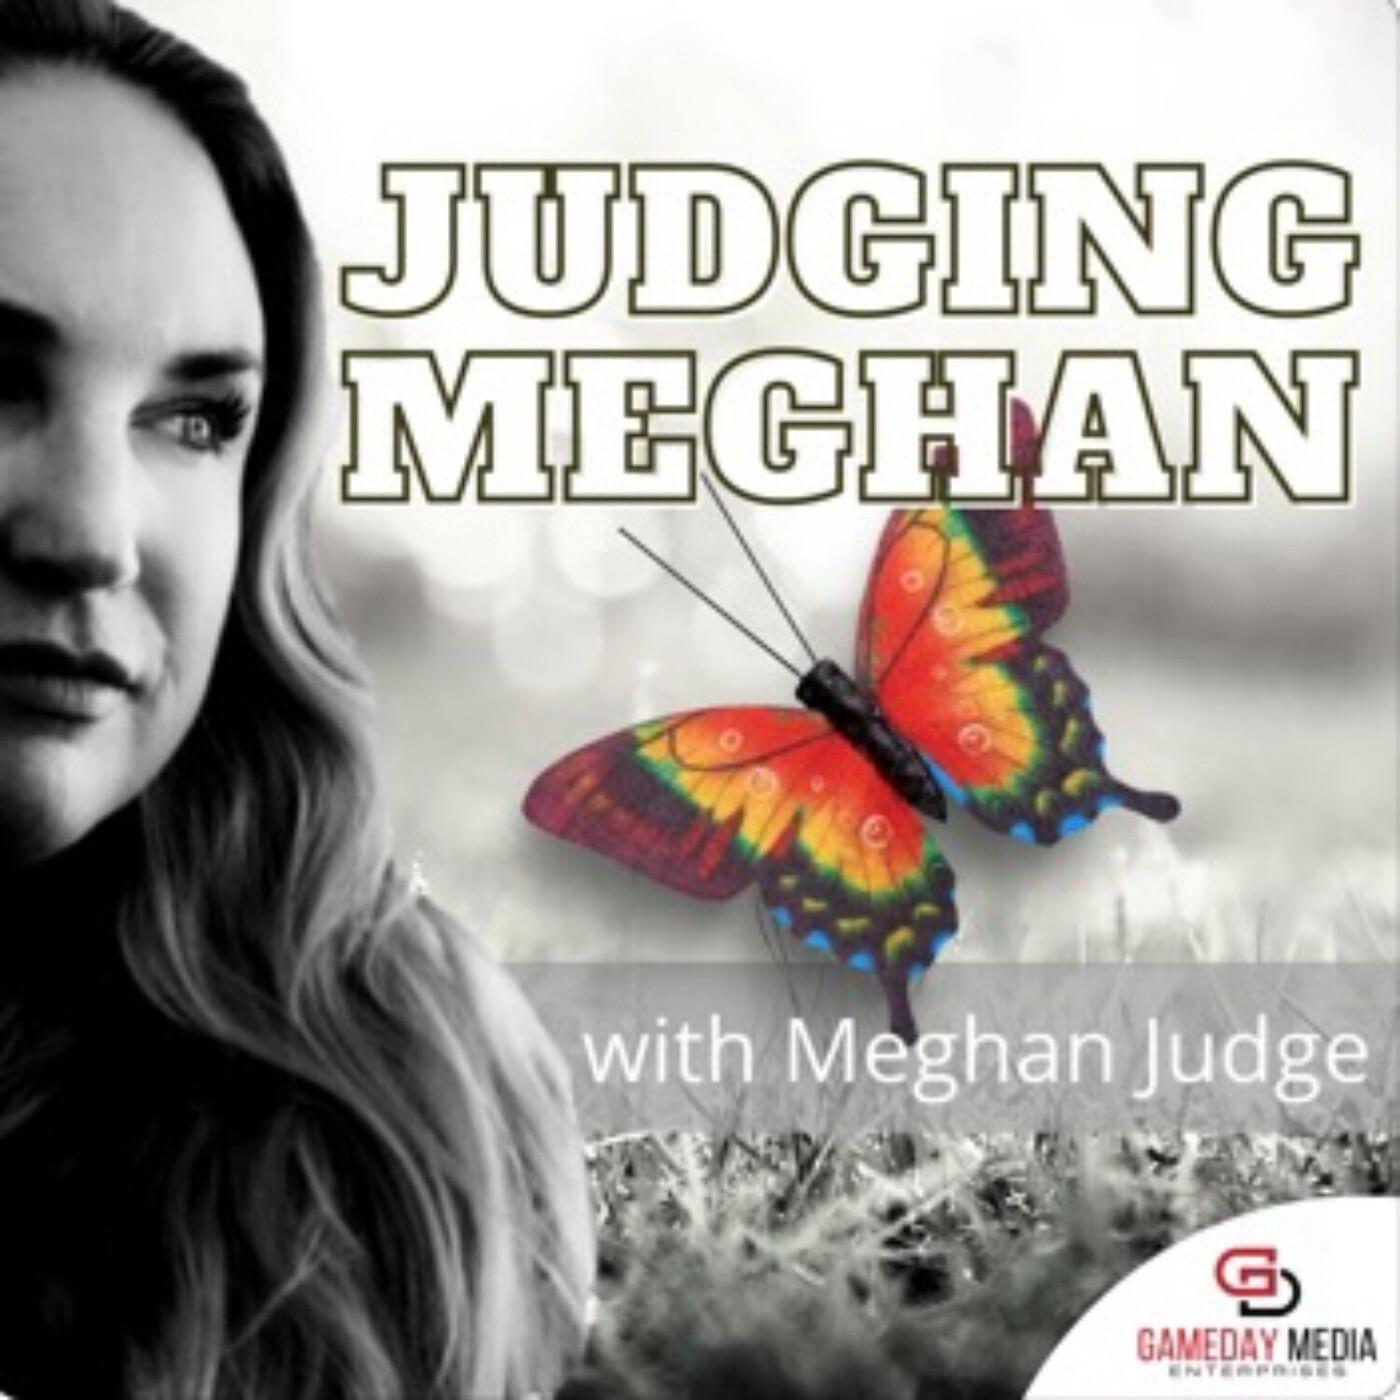 Judging Meghan Trailer